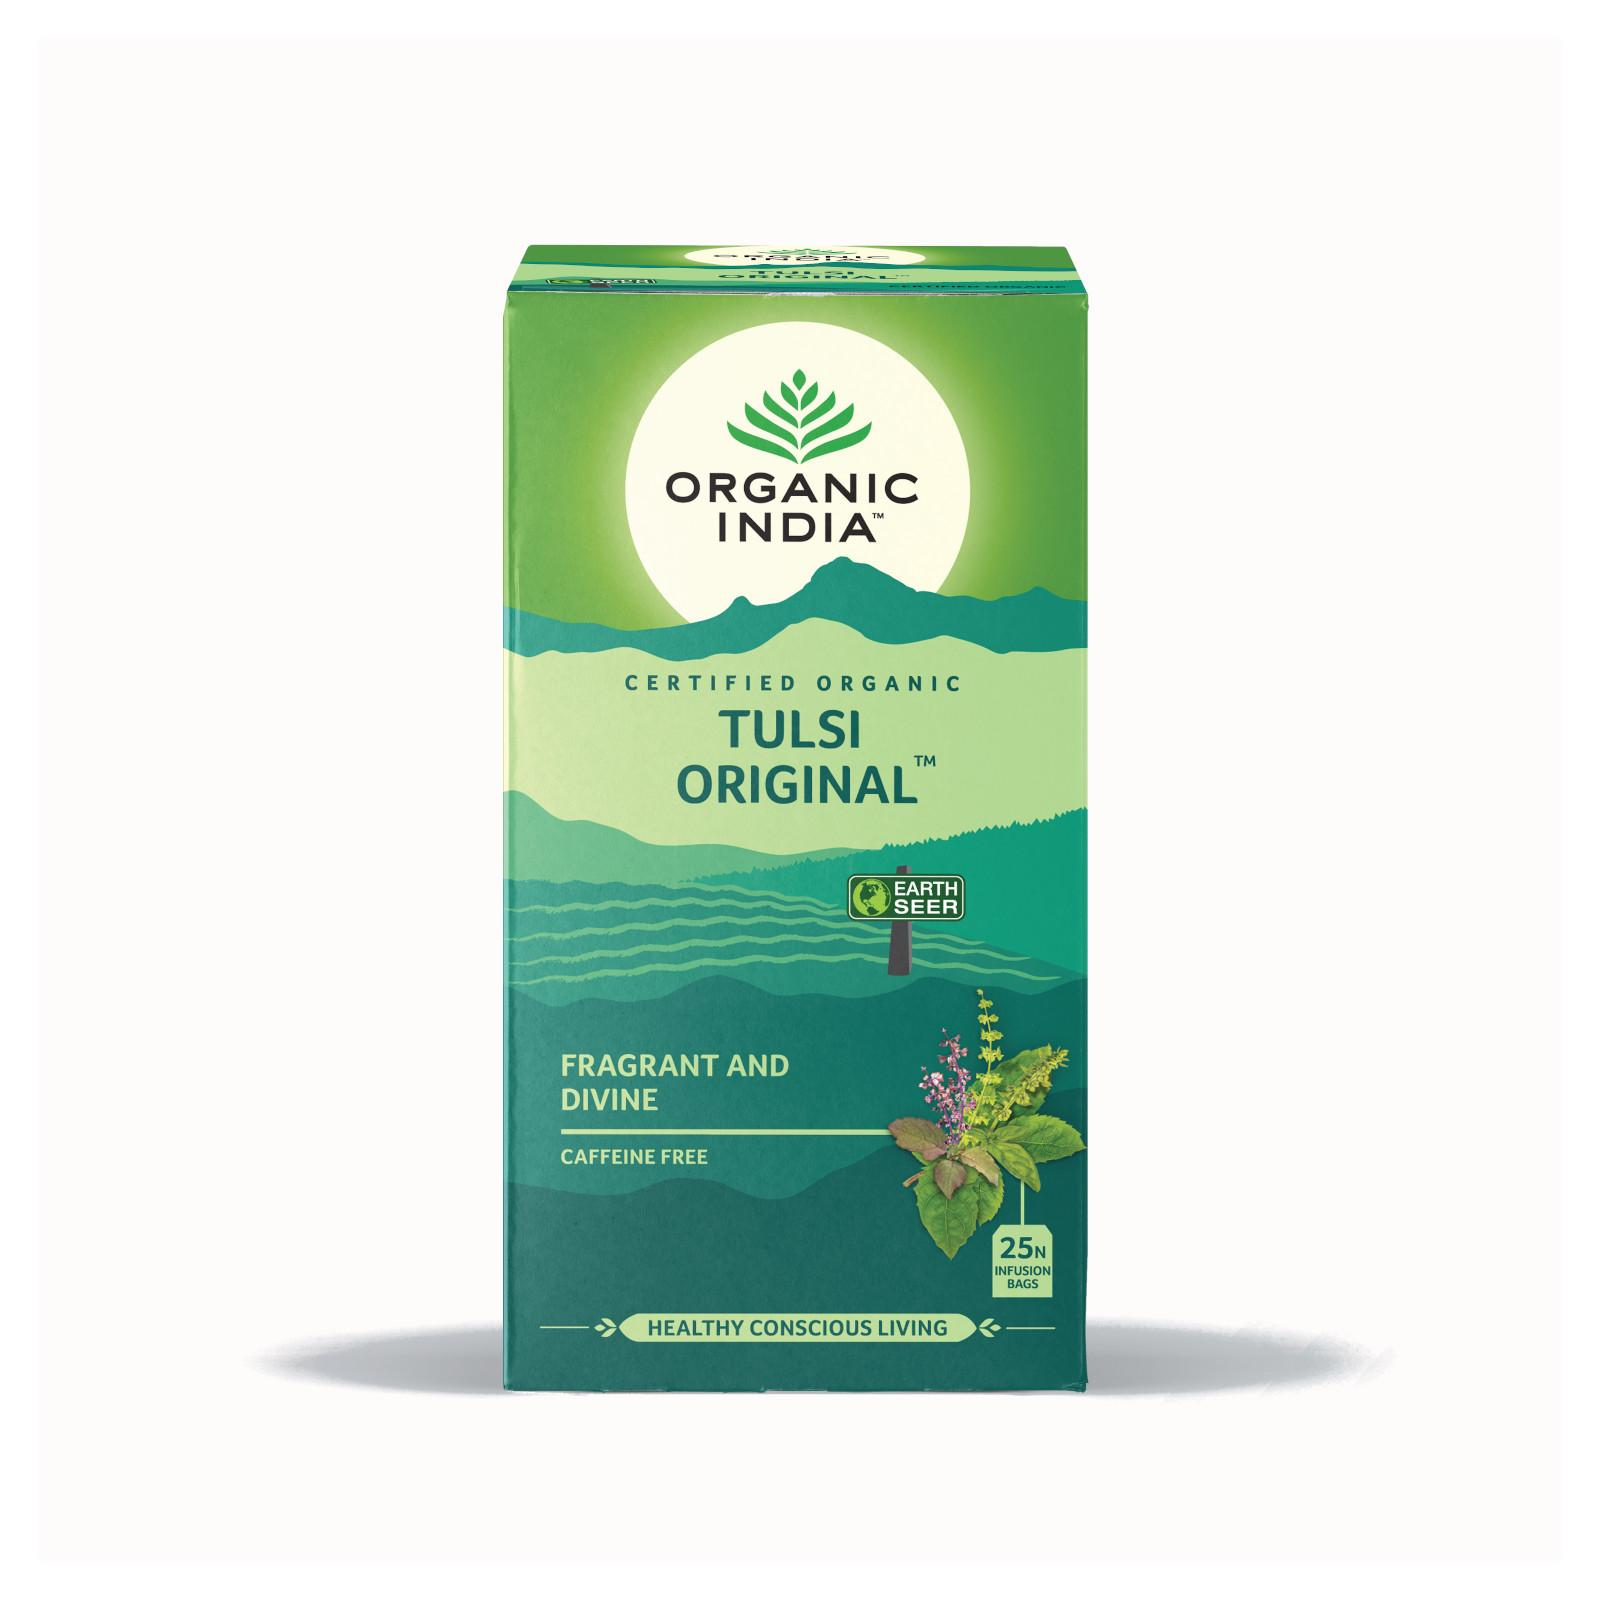 Organic India Čaj Tulsi Original, porcovaný, bio 43,5 g, 25 ks